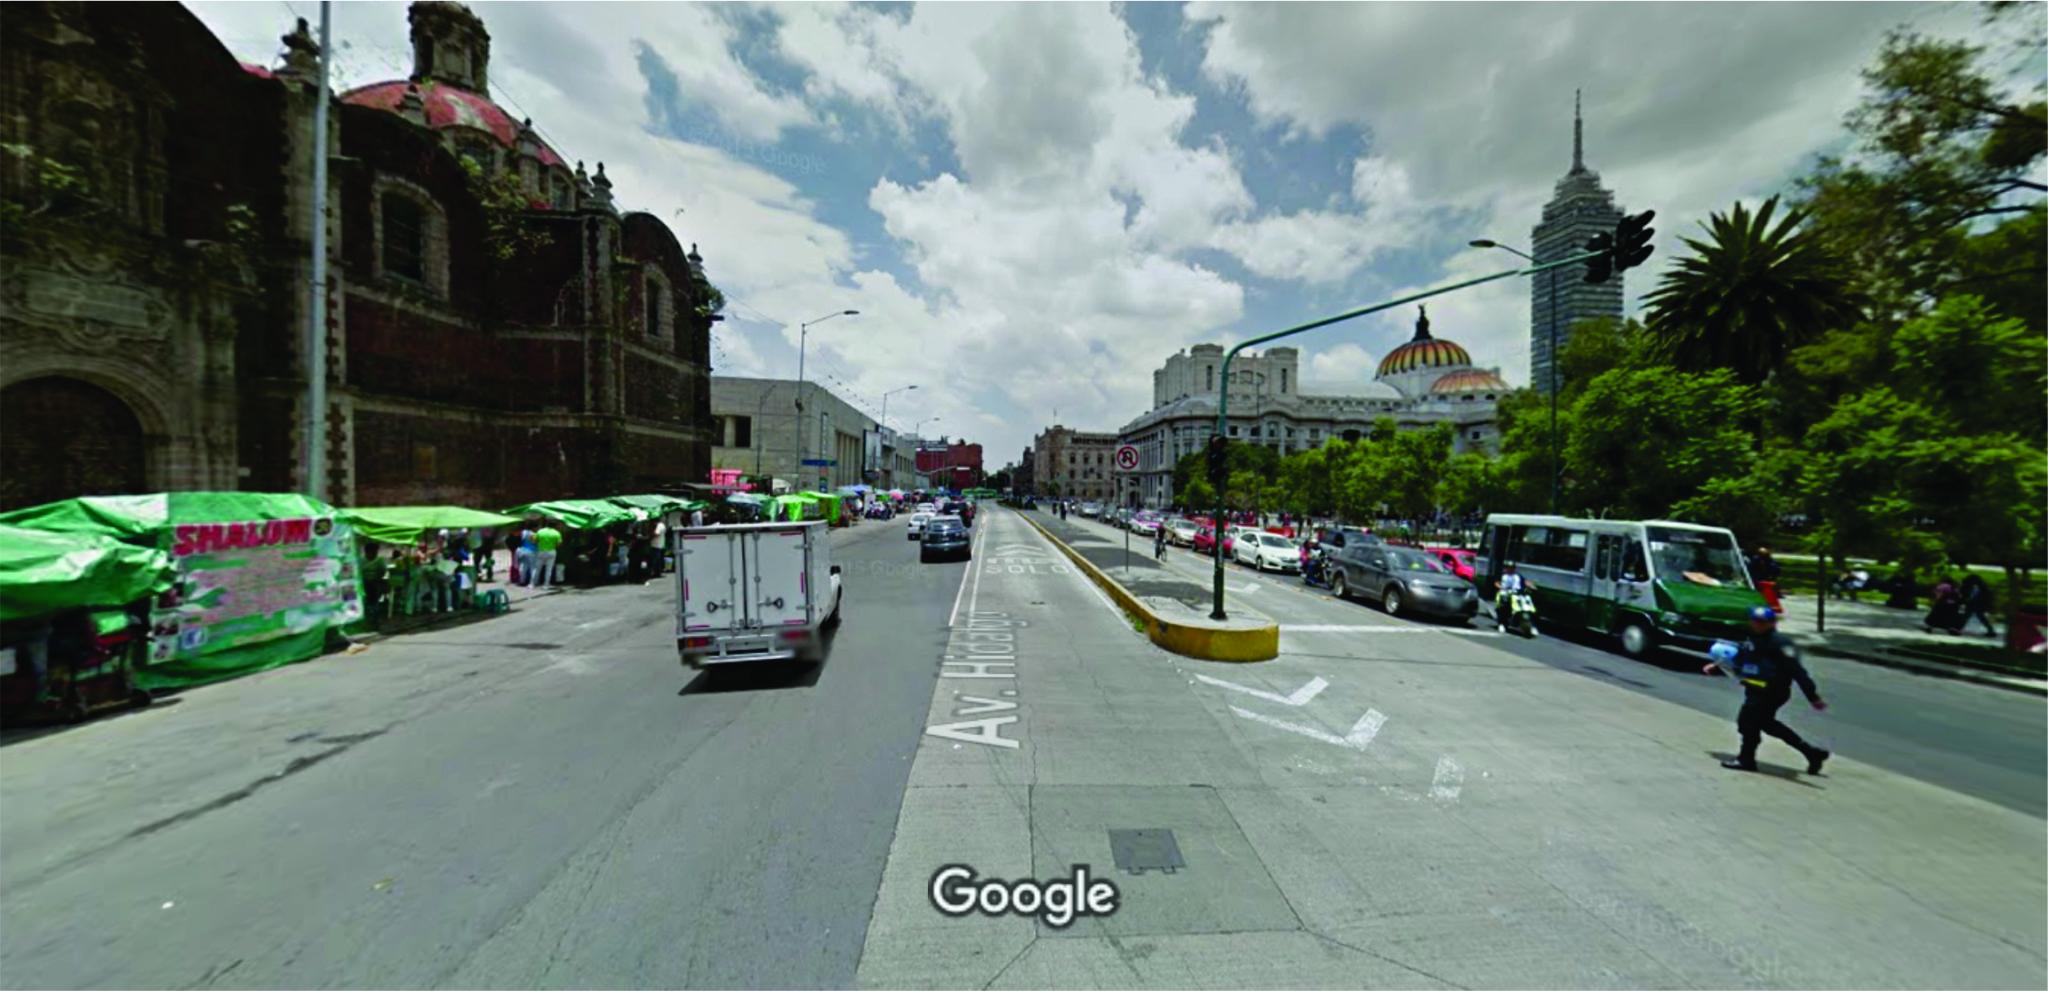 calle más antigua avenida hidalgo Mexico DF